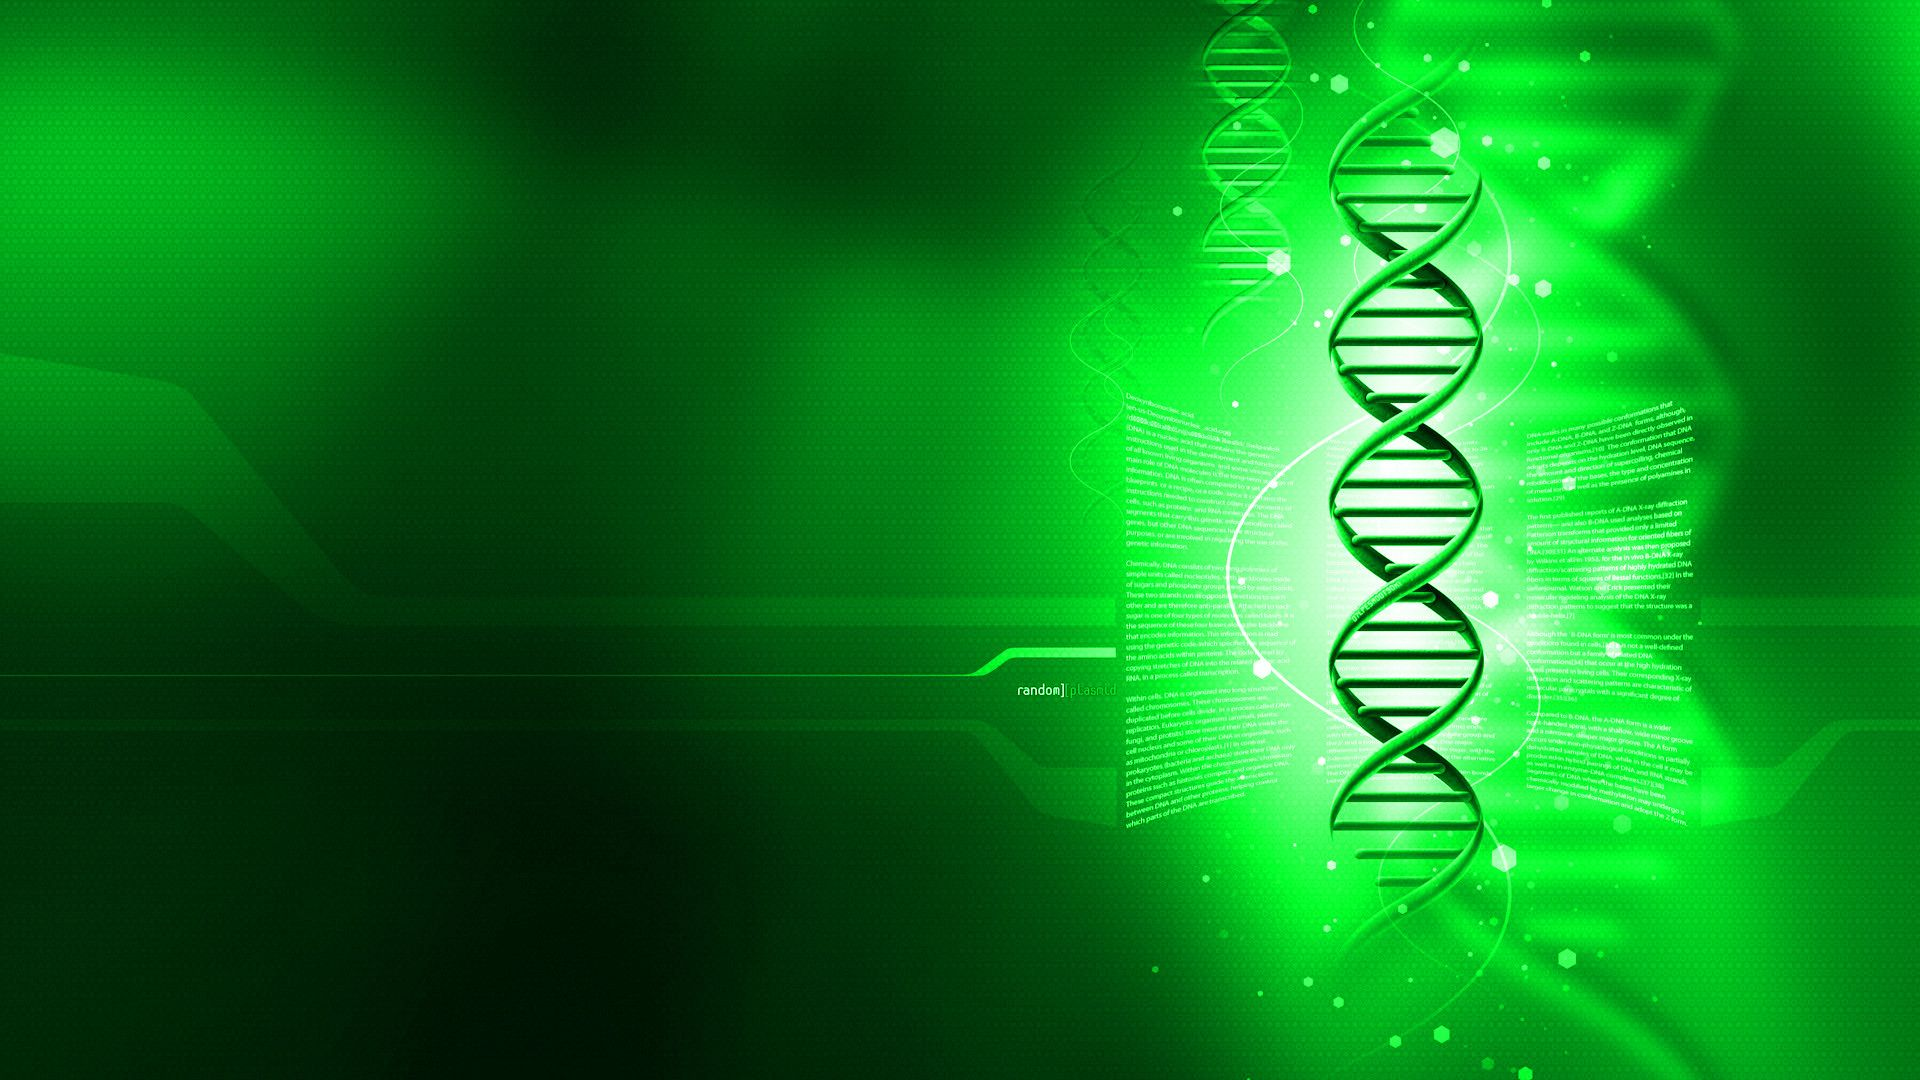 Dna Wallpaper High Resolution: DNA HD Wallpapers